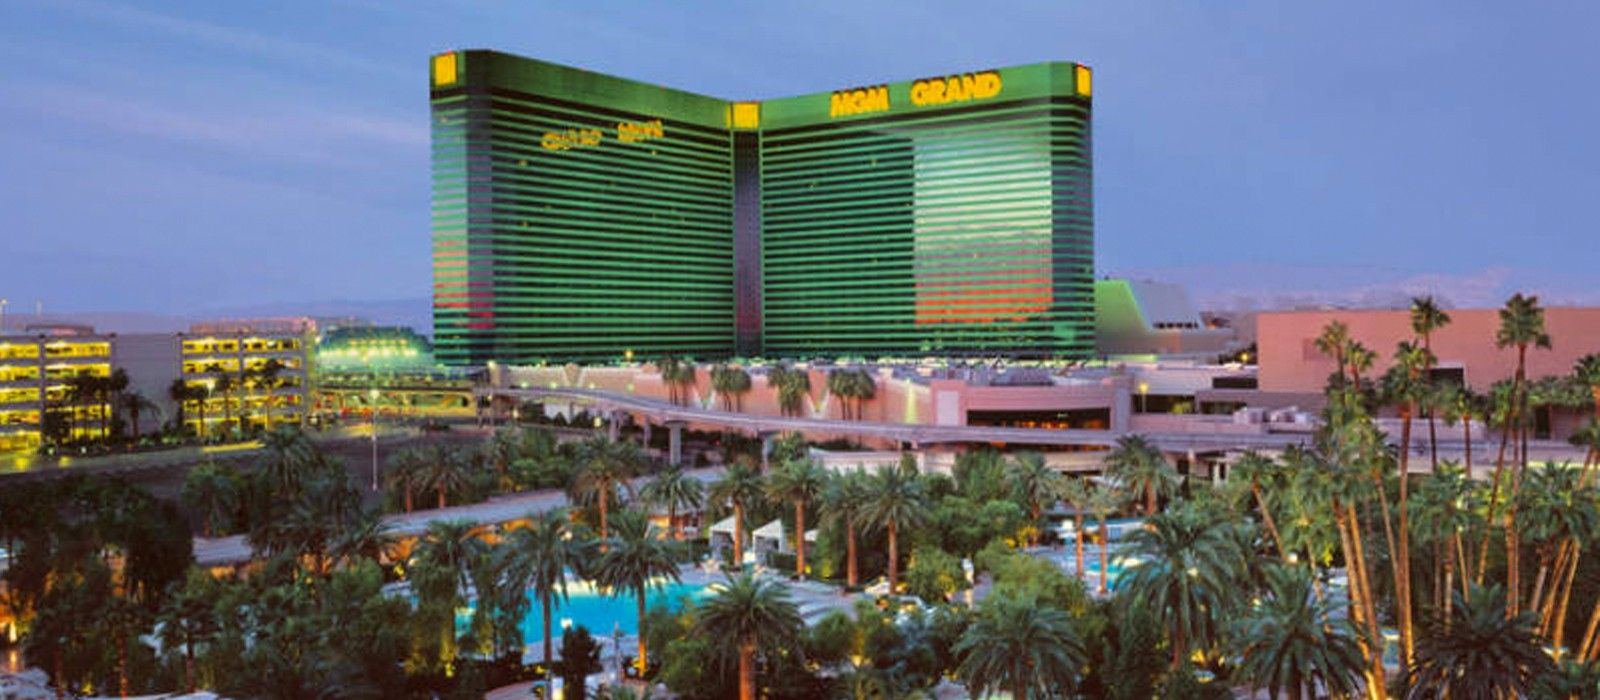 Inoltro mgm grand las vegas dream city best casino